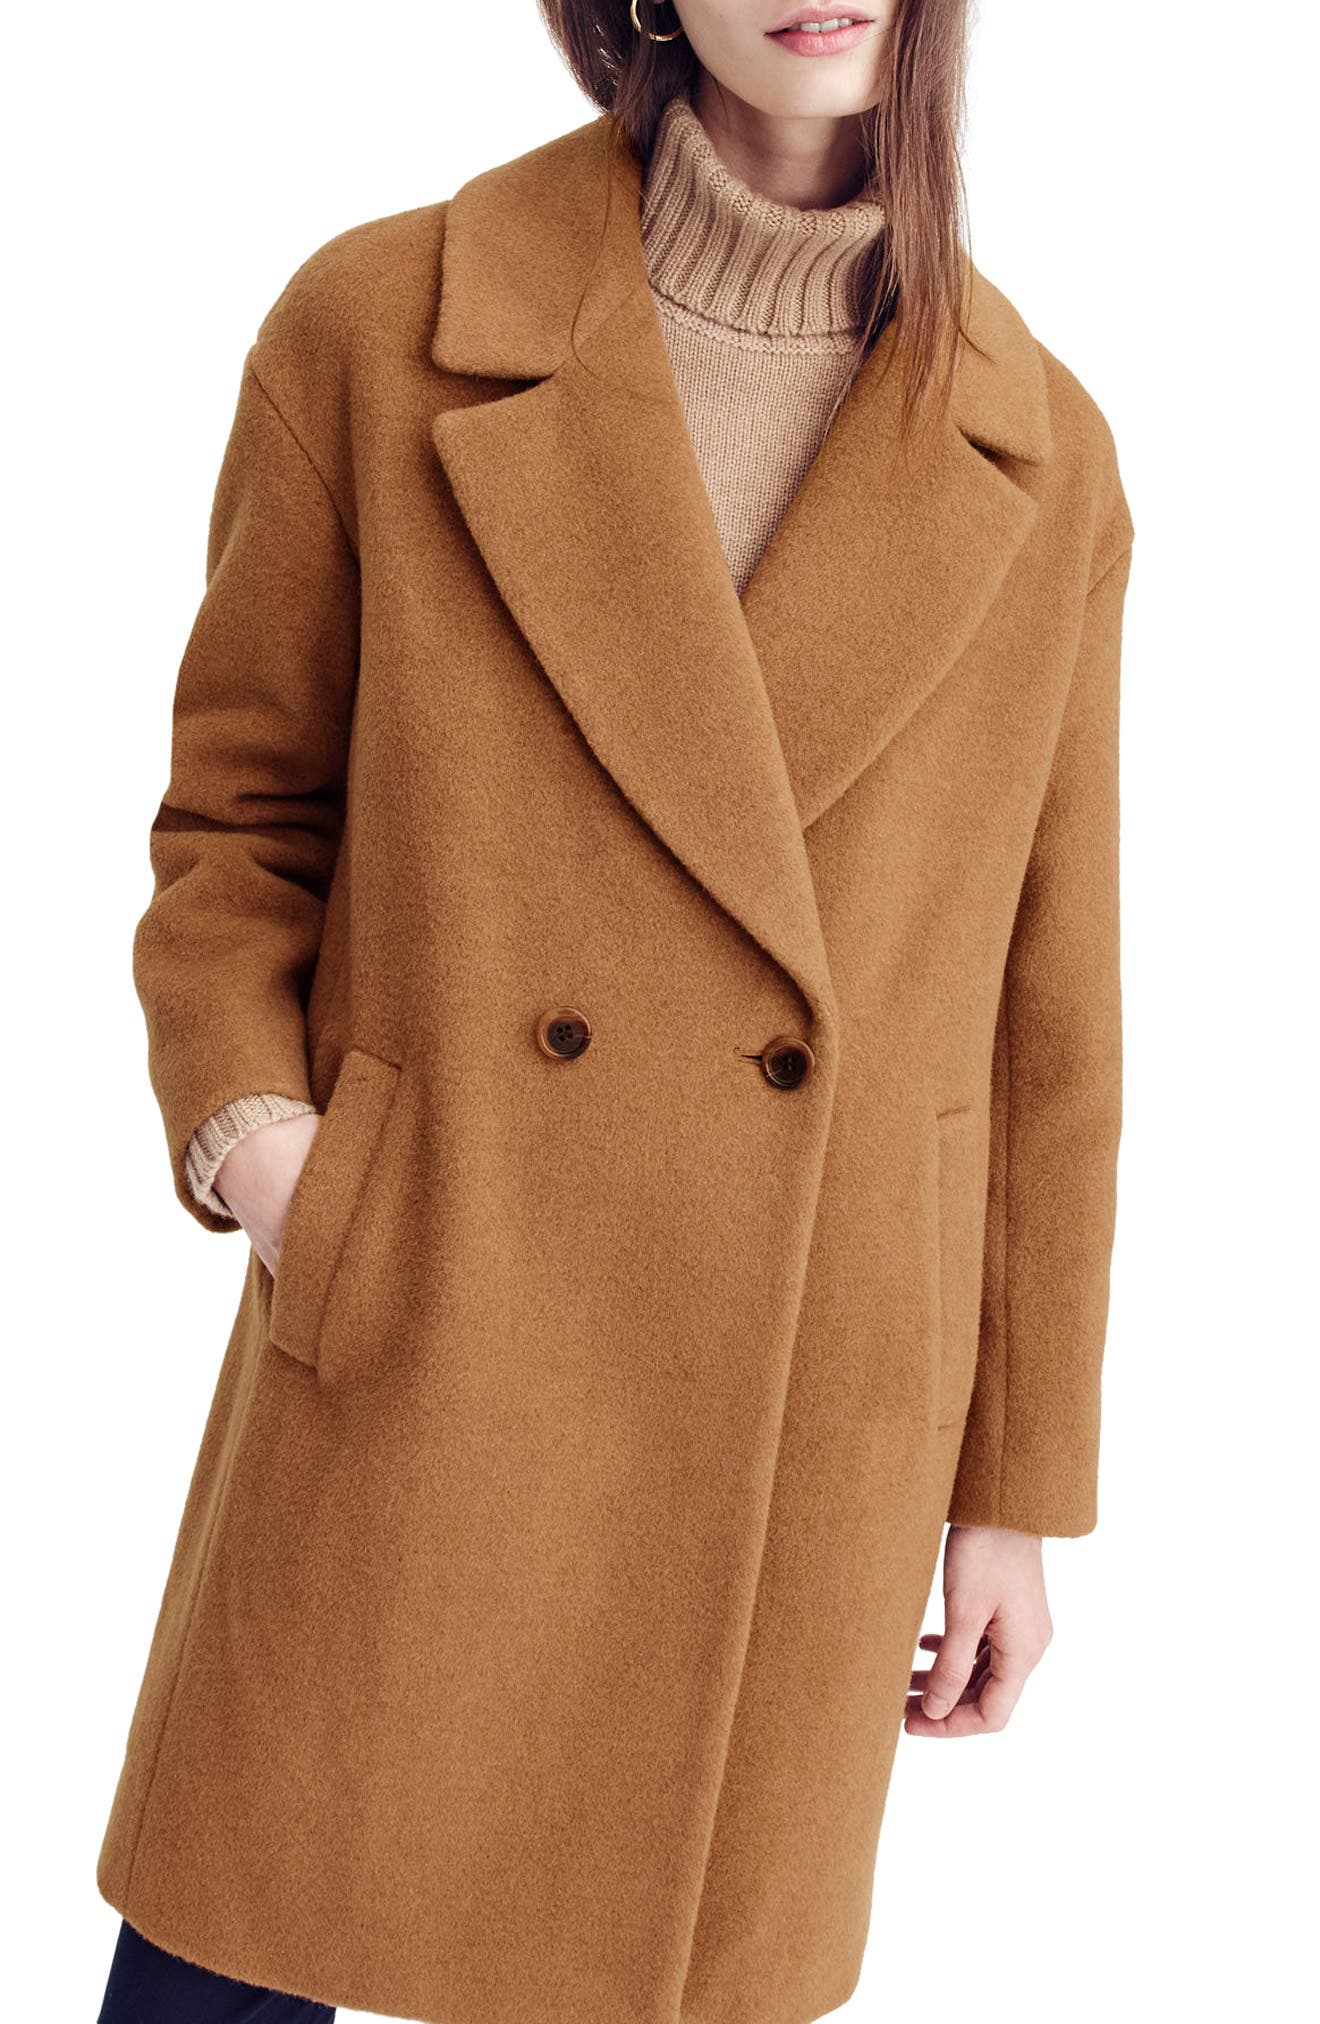 J.Crew Maxine Camel Hair Coat